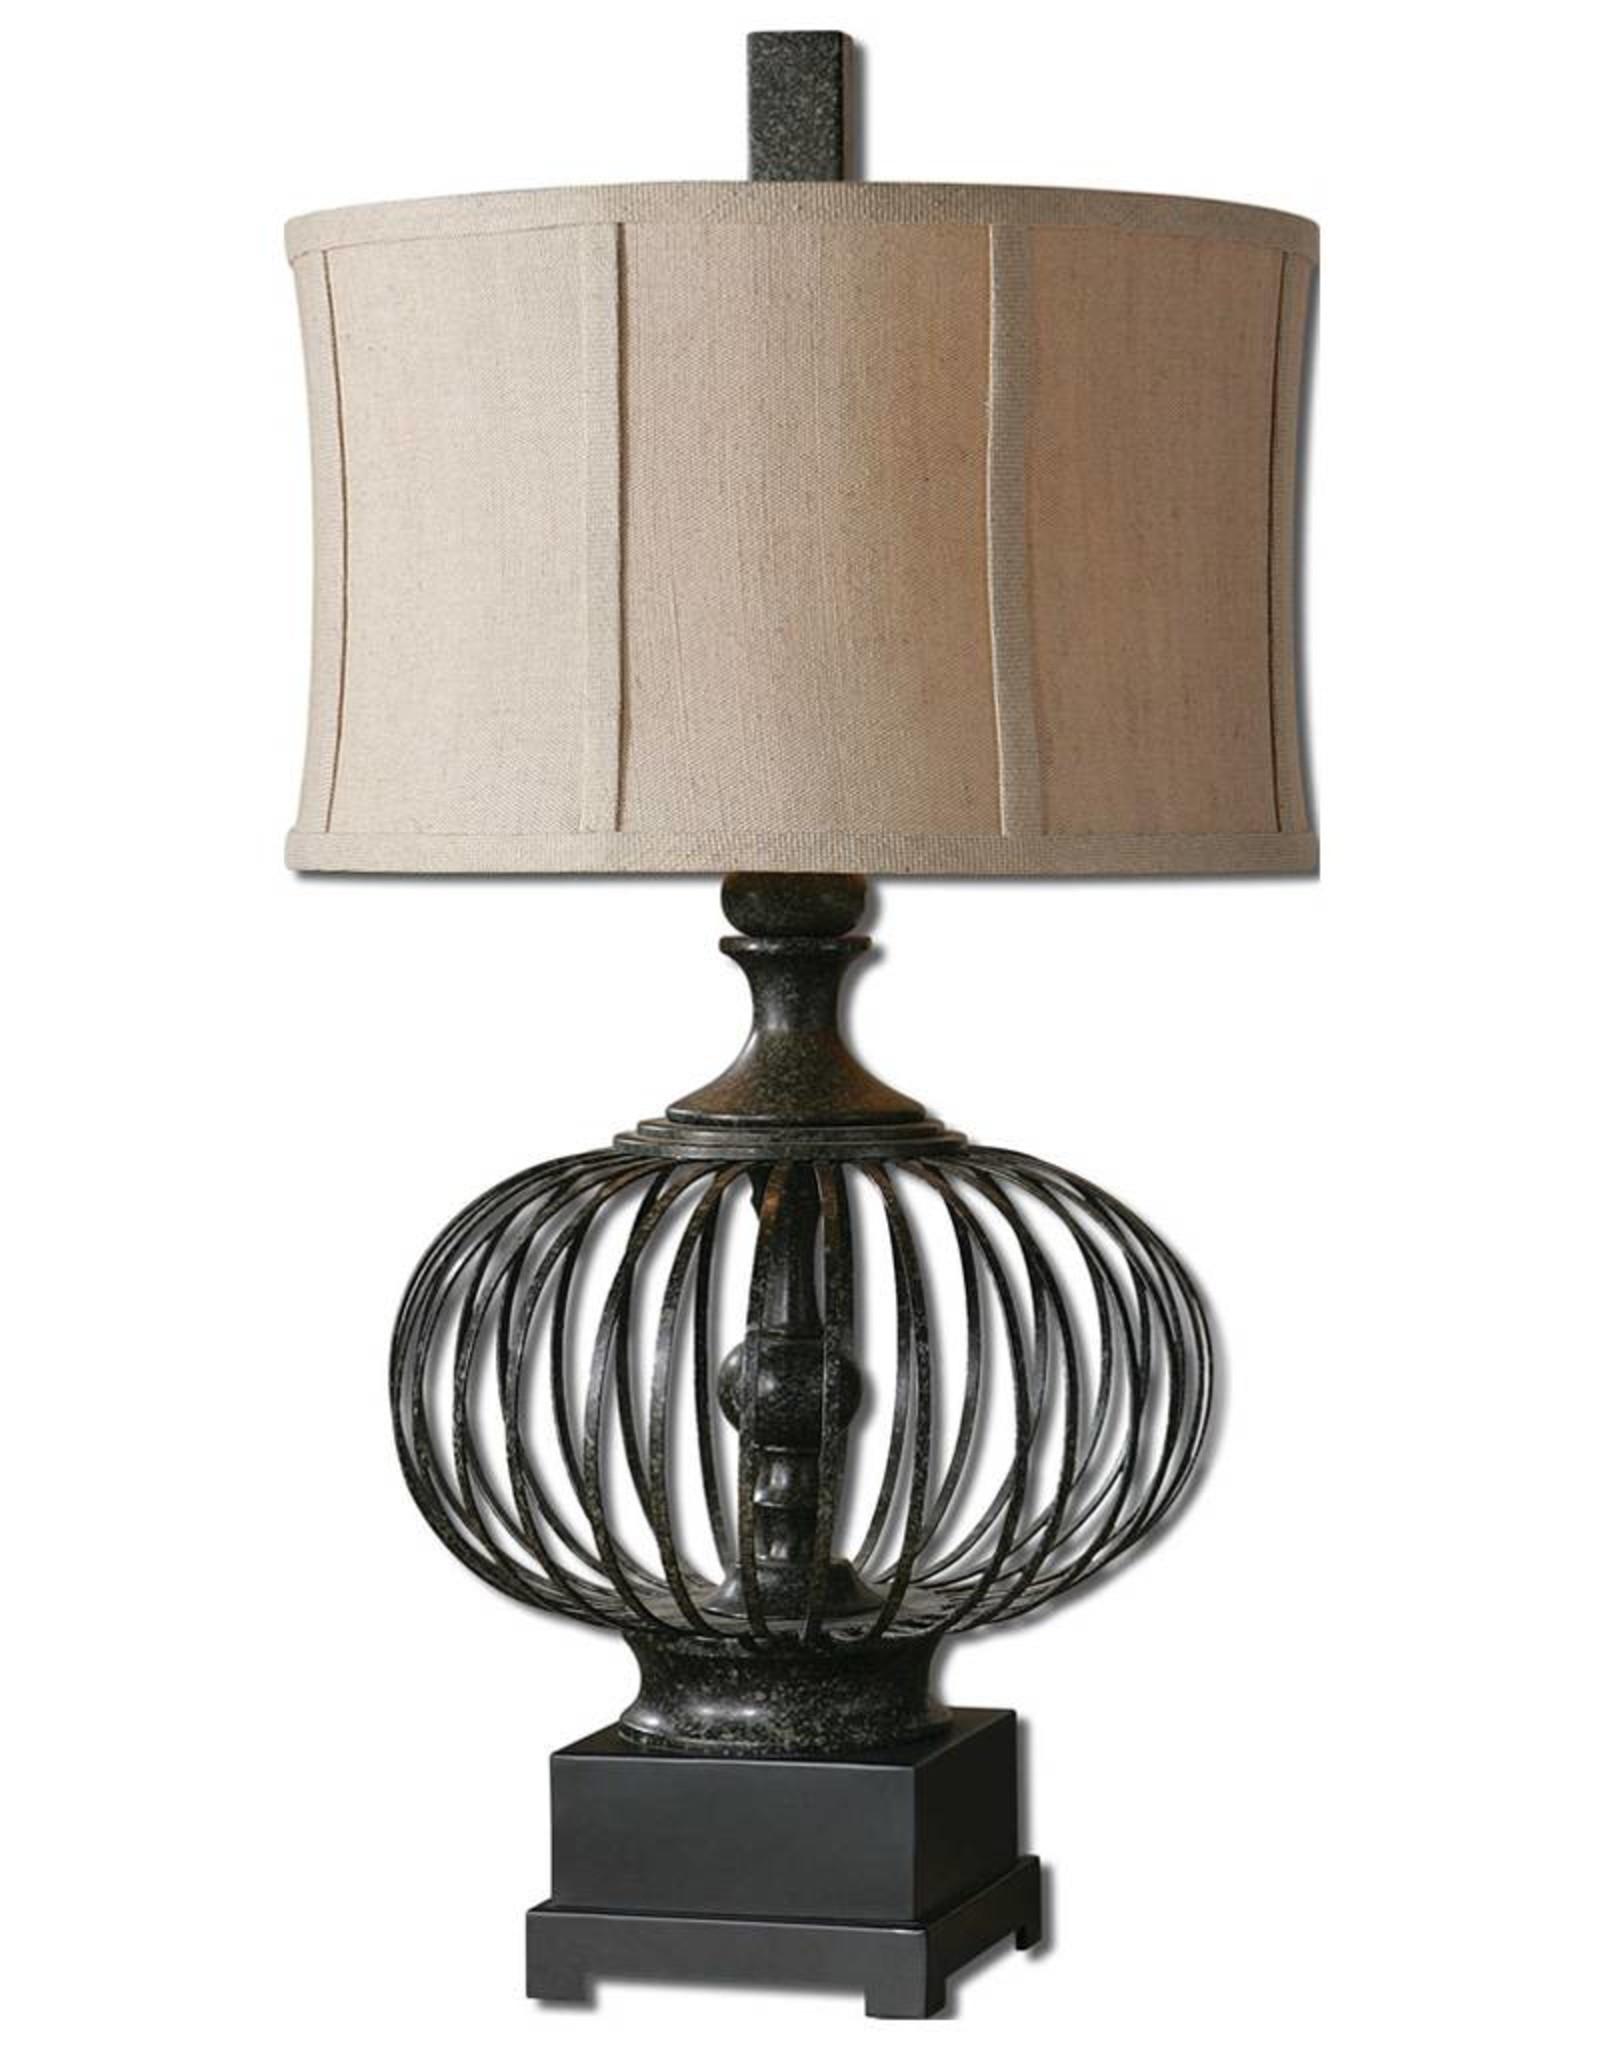 Lipioni Table Lamp